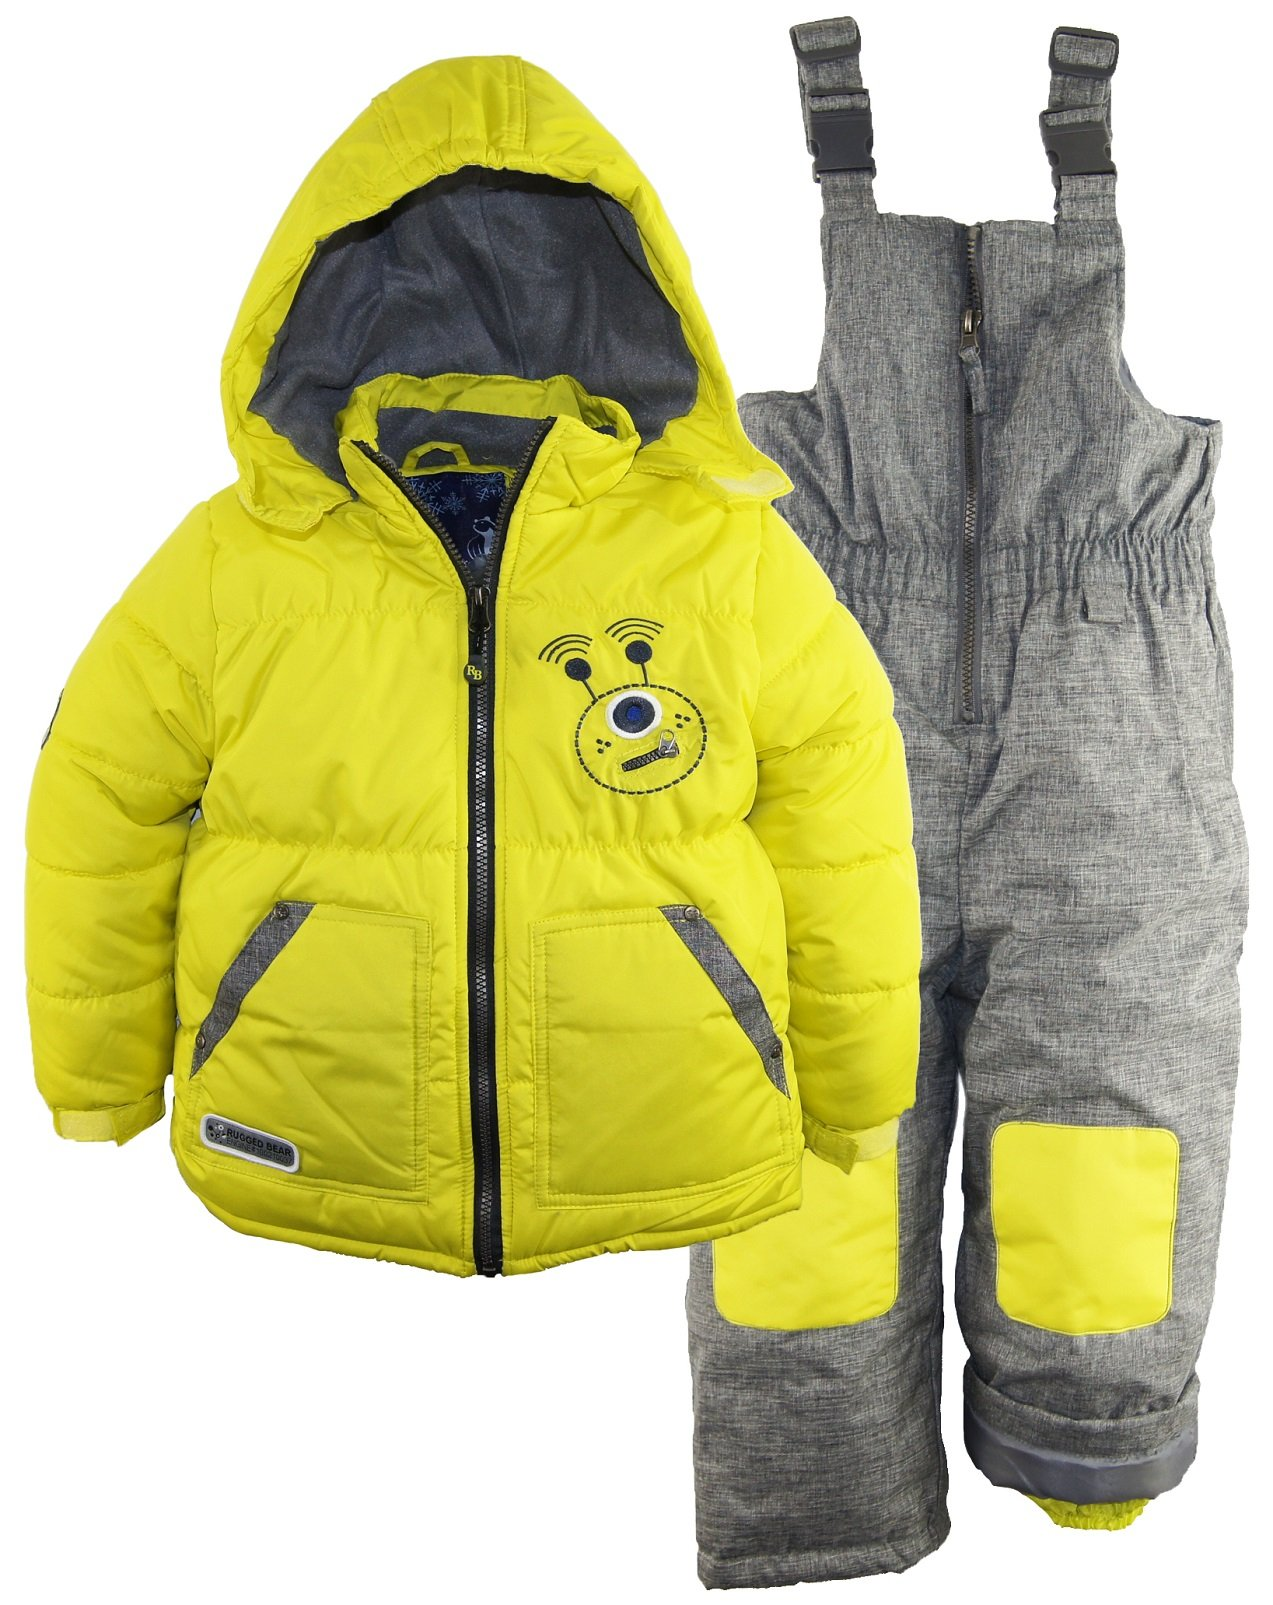 Rugged Bear Little Boys' Robot Winter 2 Piece Snowsuit Ski Bib Pant Set., Acid, 2T